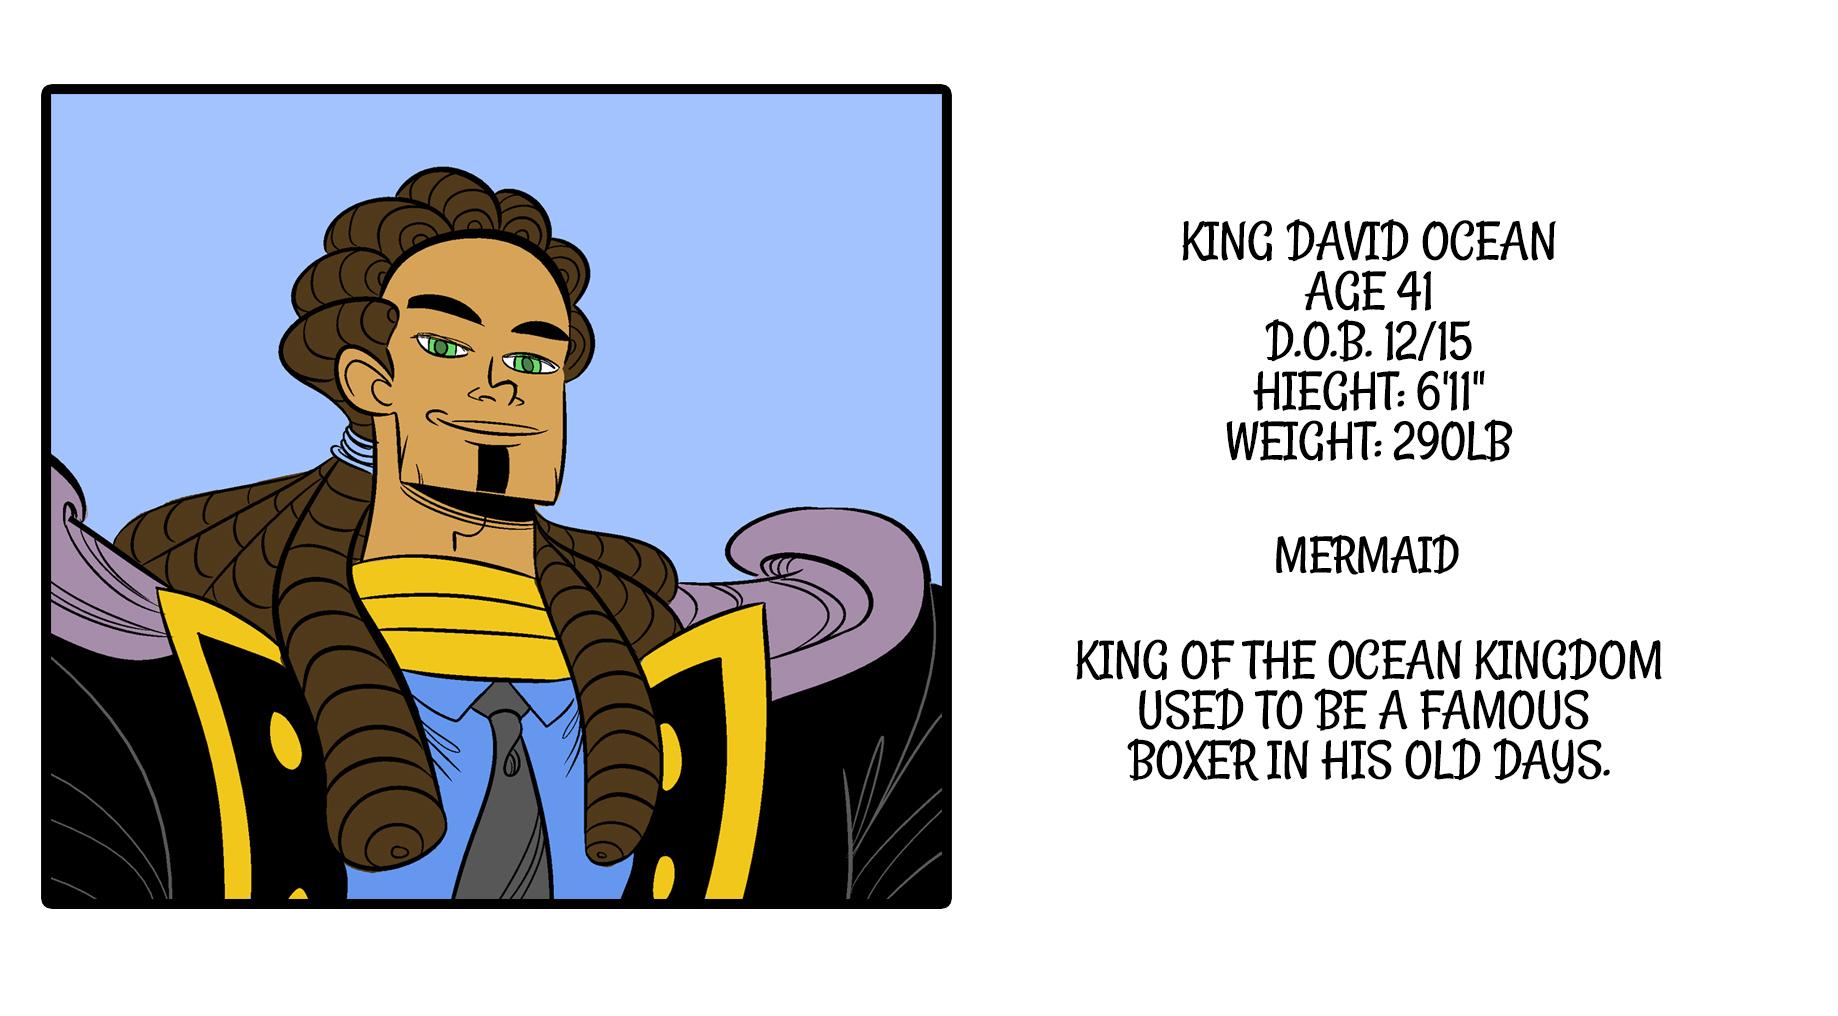 KING DAVID A.jpg